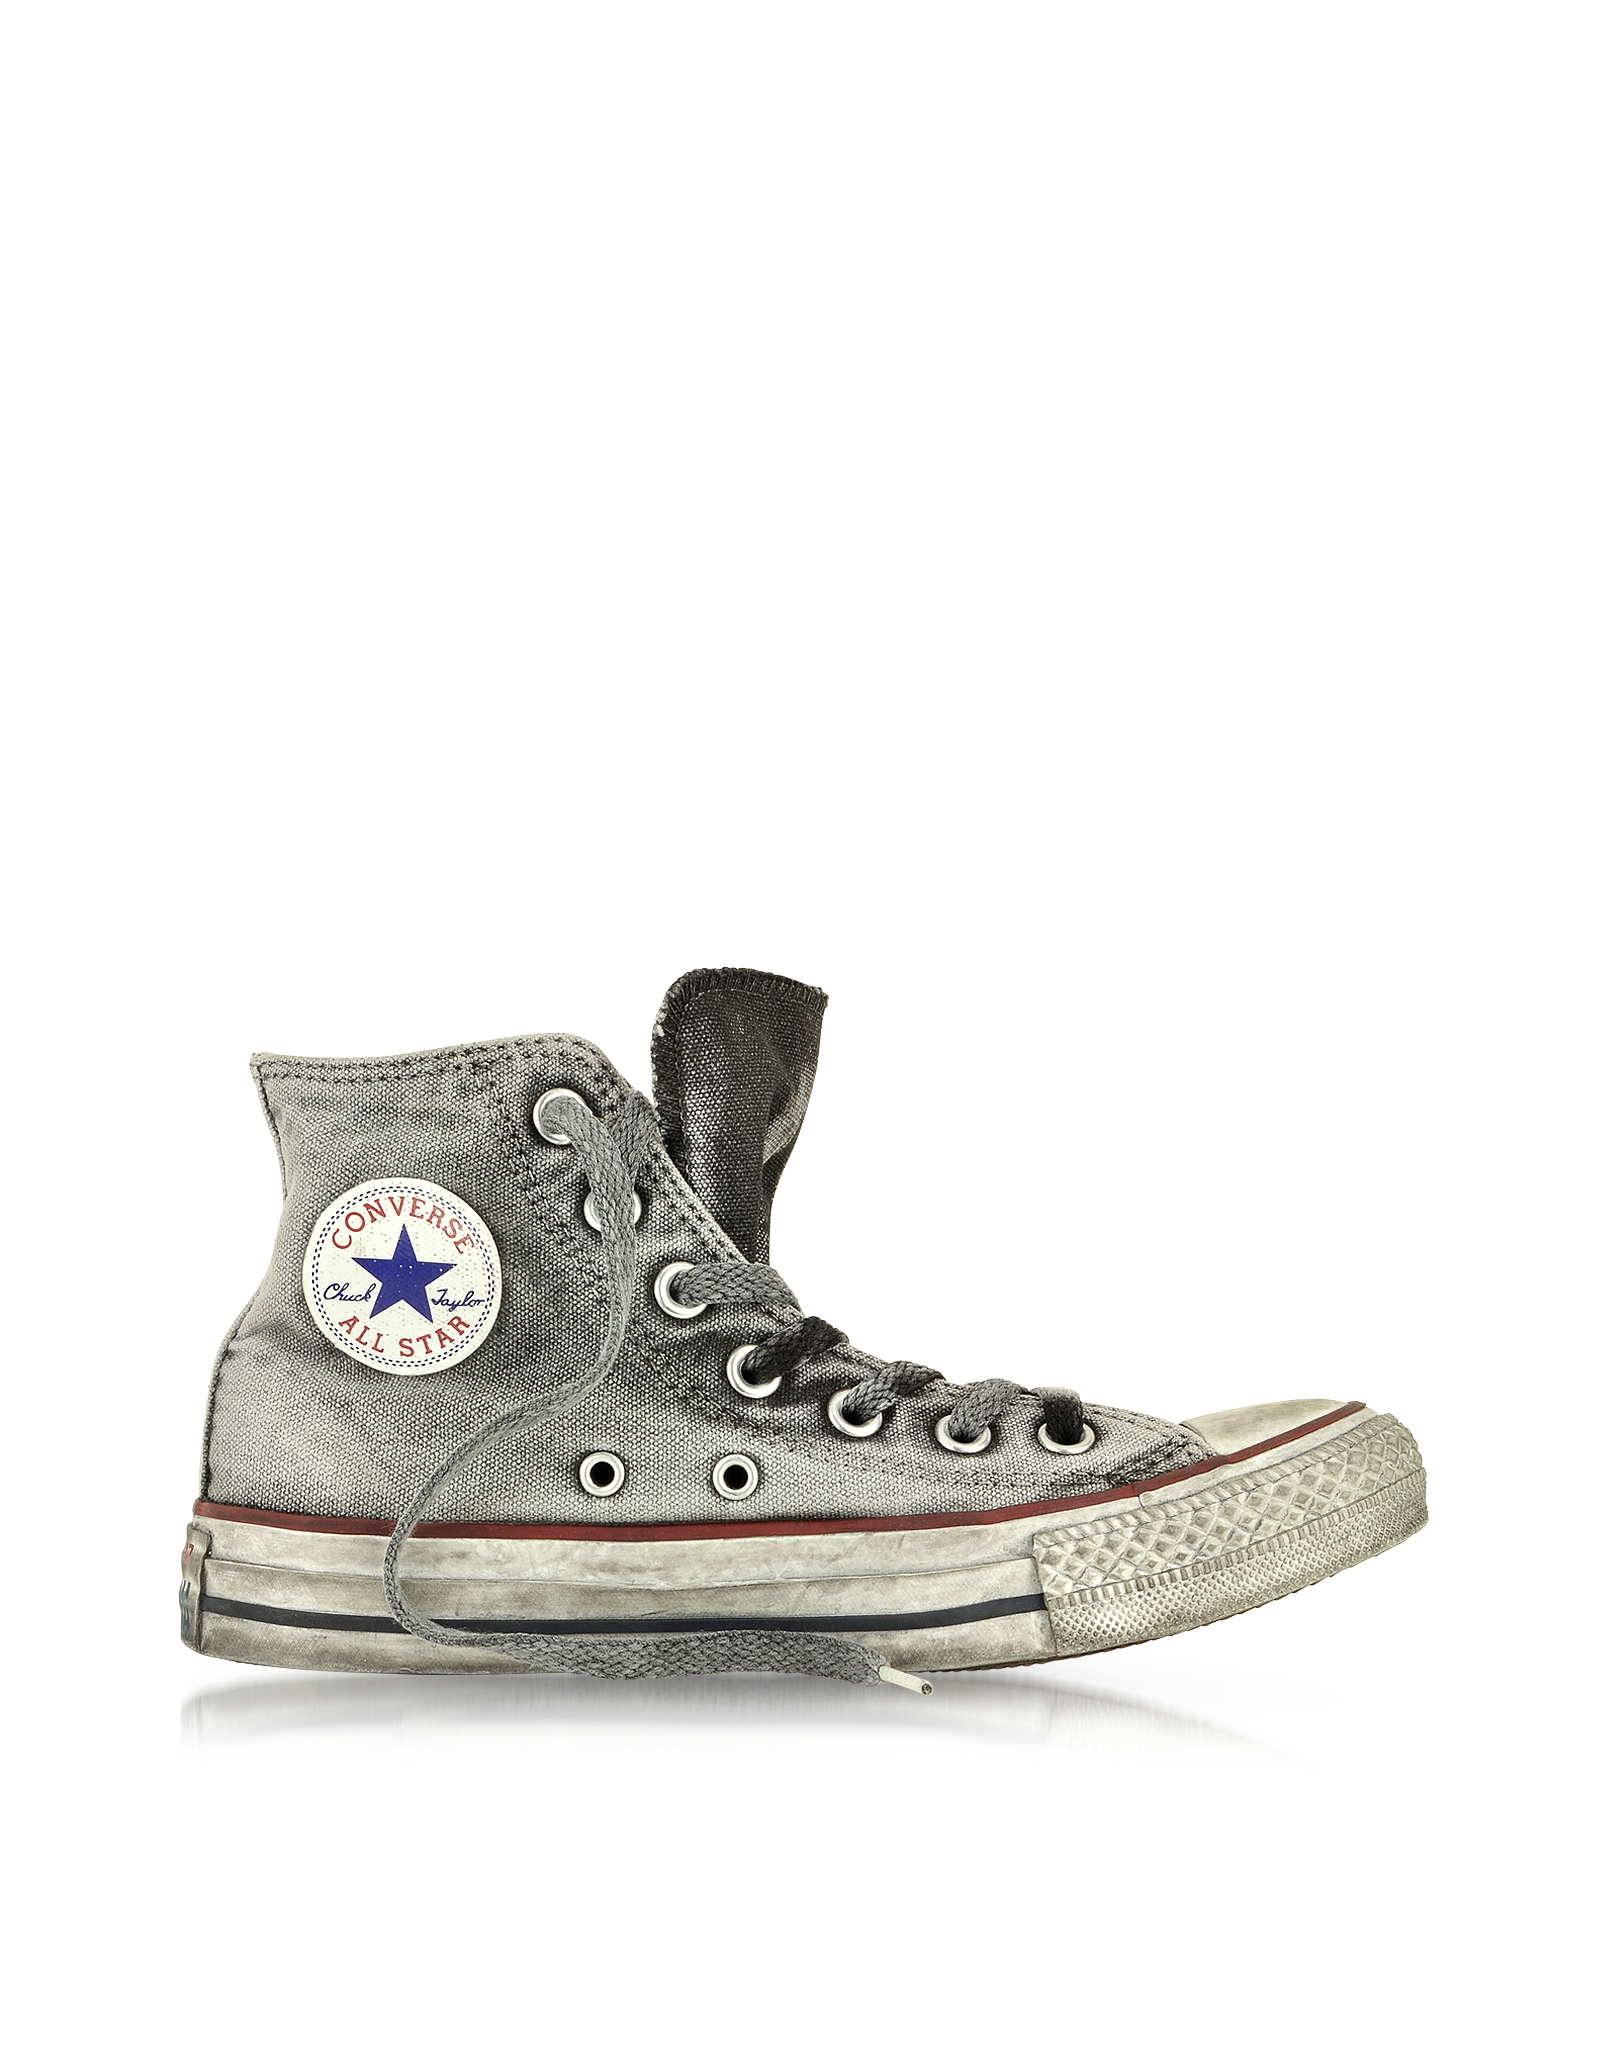 641fbea91dd2 Converse All Star High-Top Smoke Canvas Ltd Sneaker in Gray - Lyst